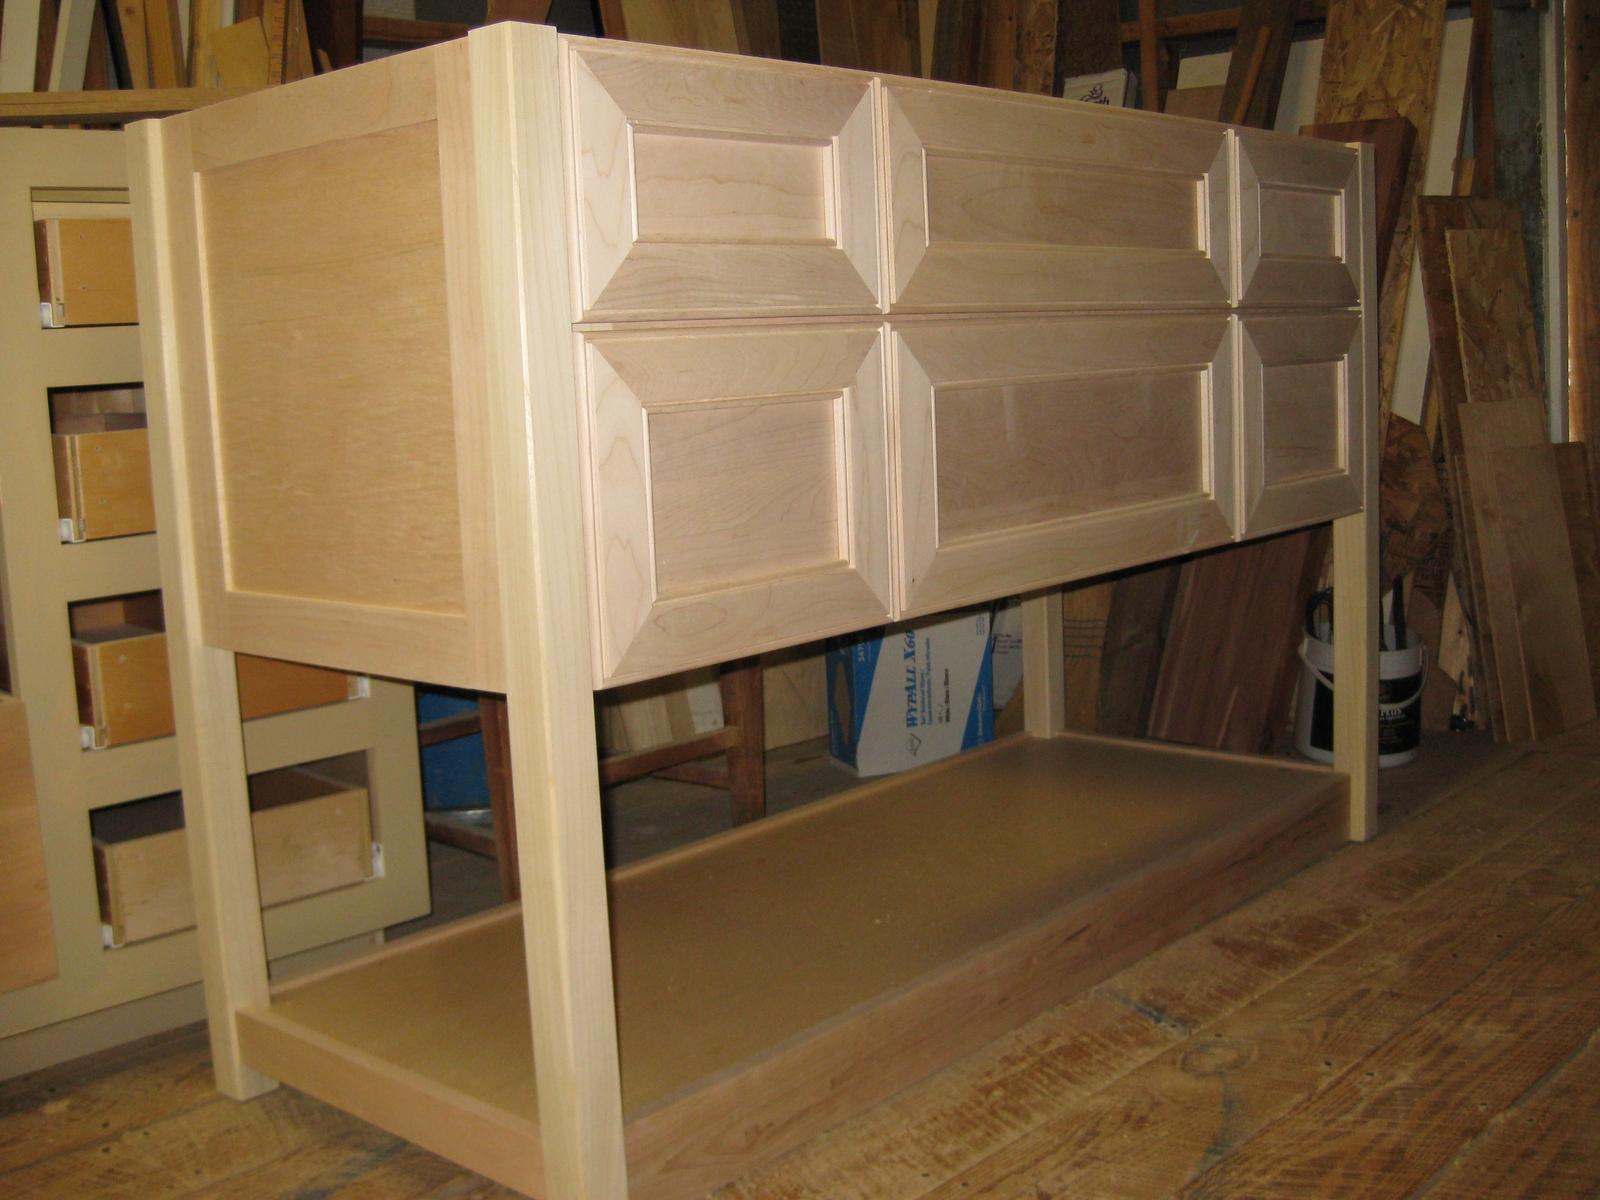 Unfurnished Unfinished Cabinets